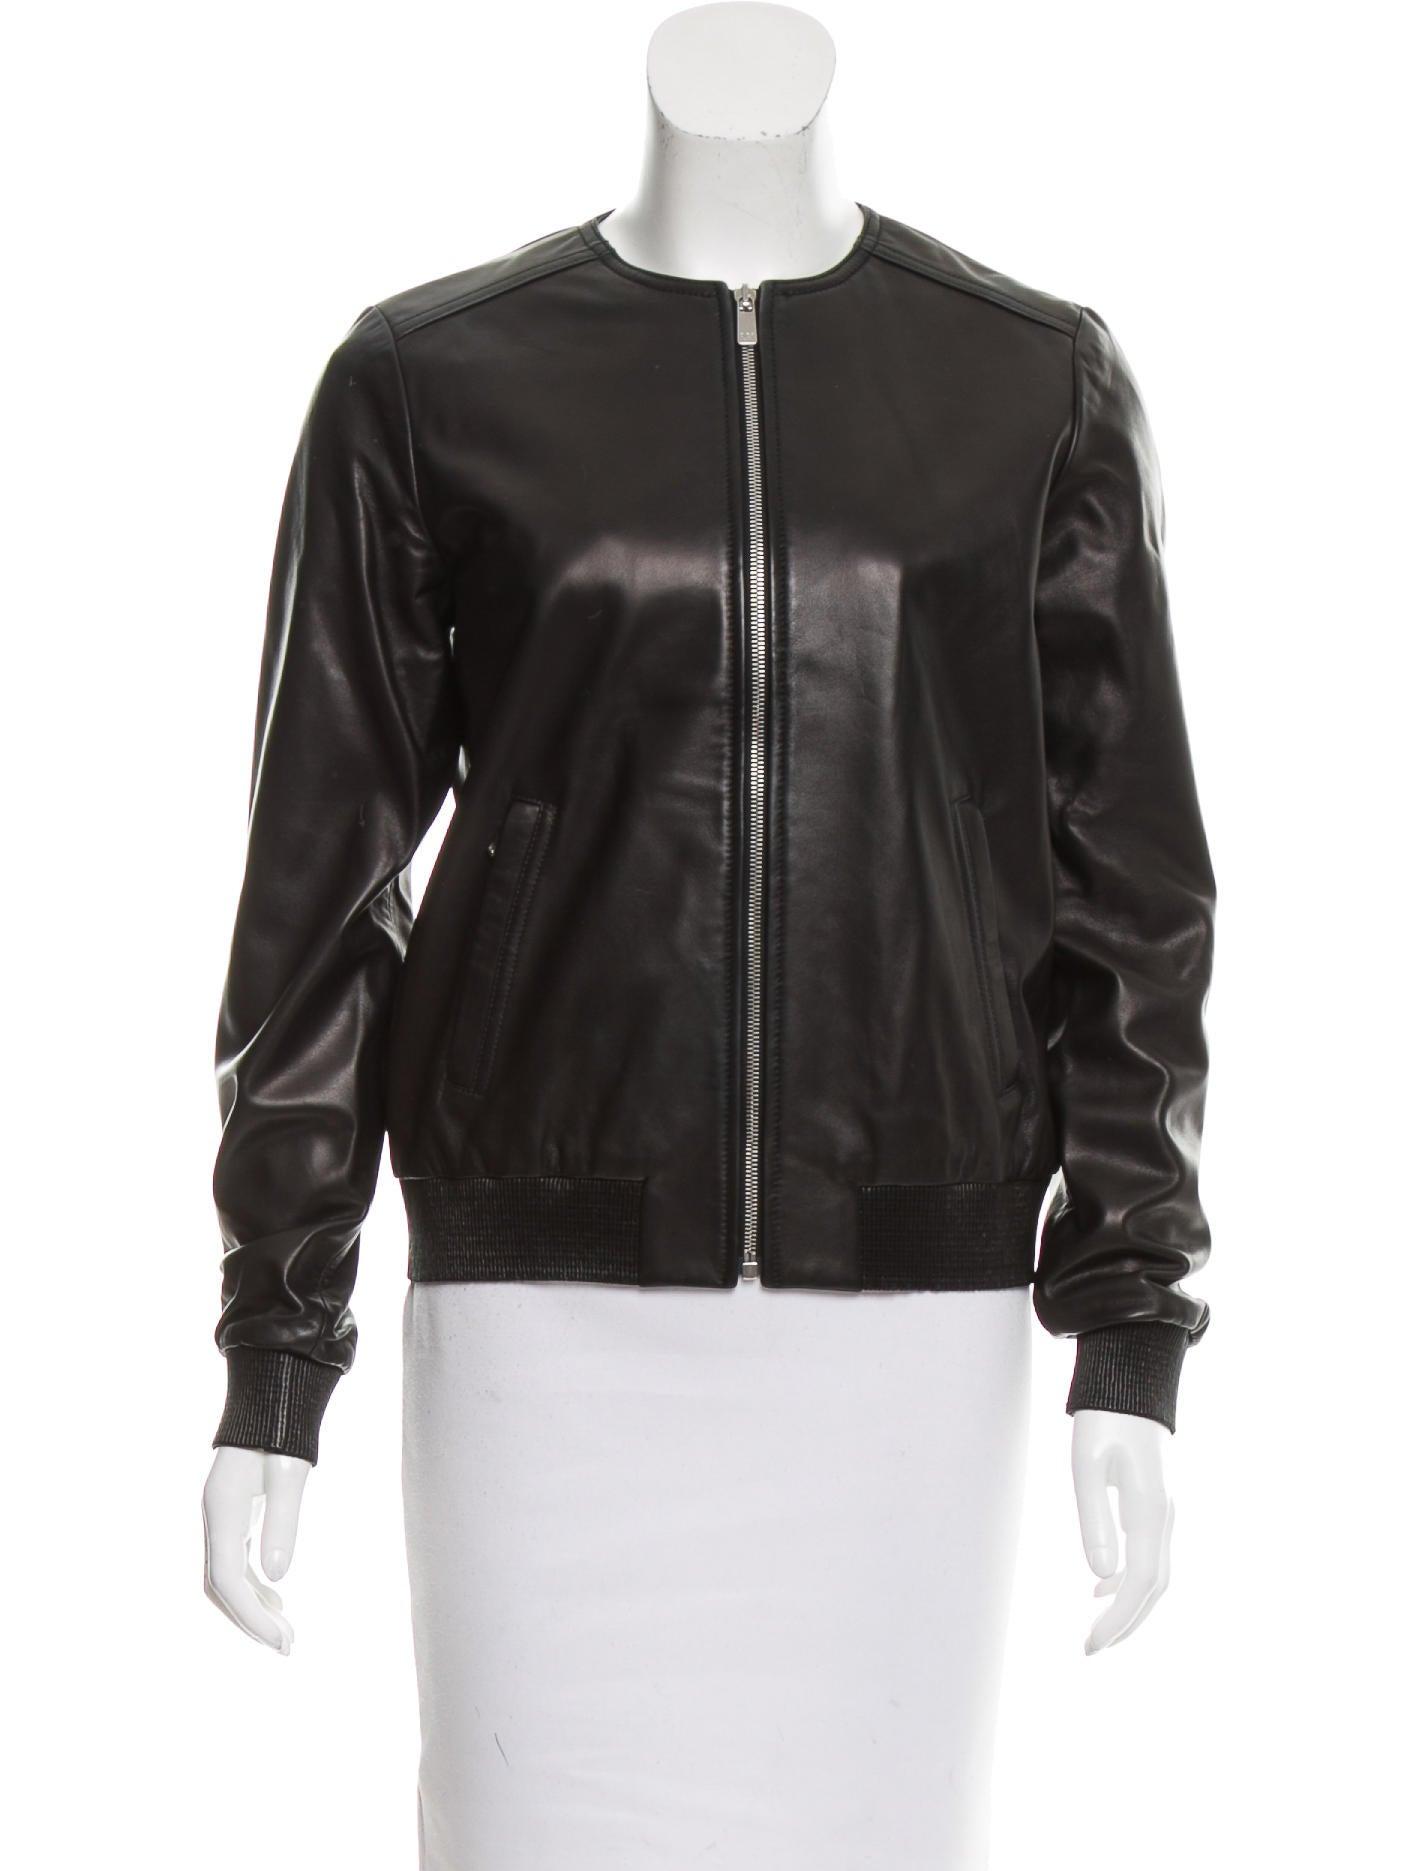 Leather jacket collarless